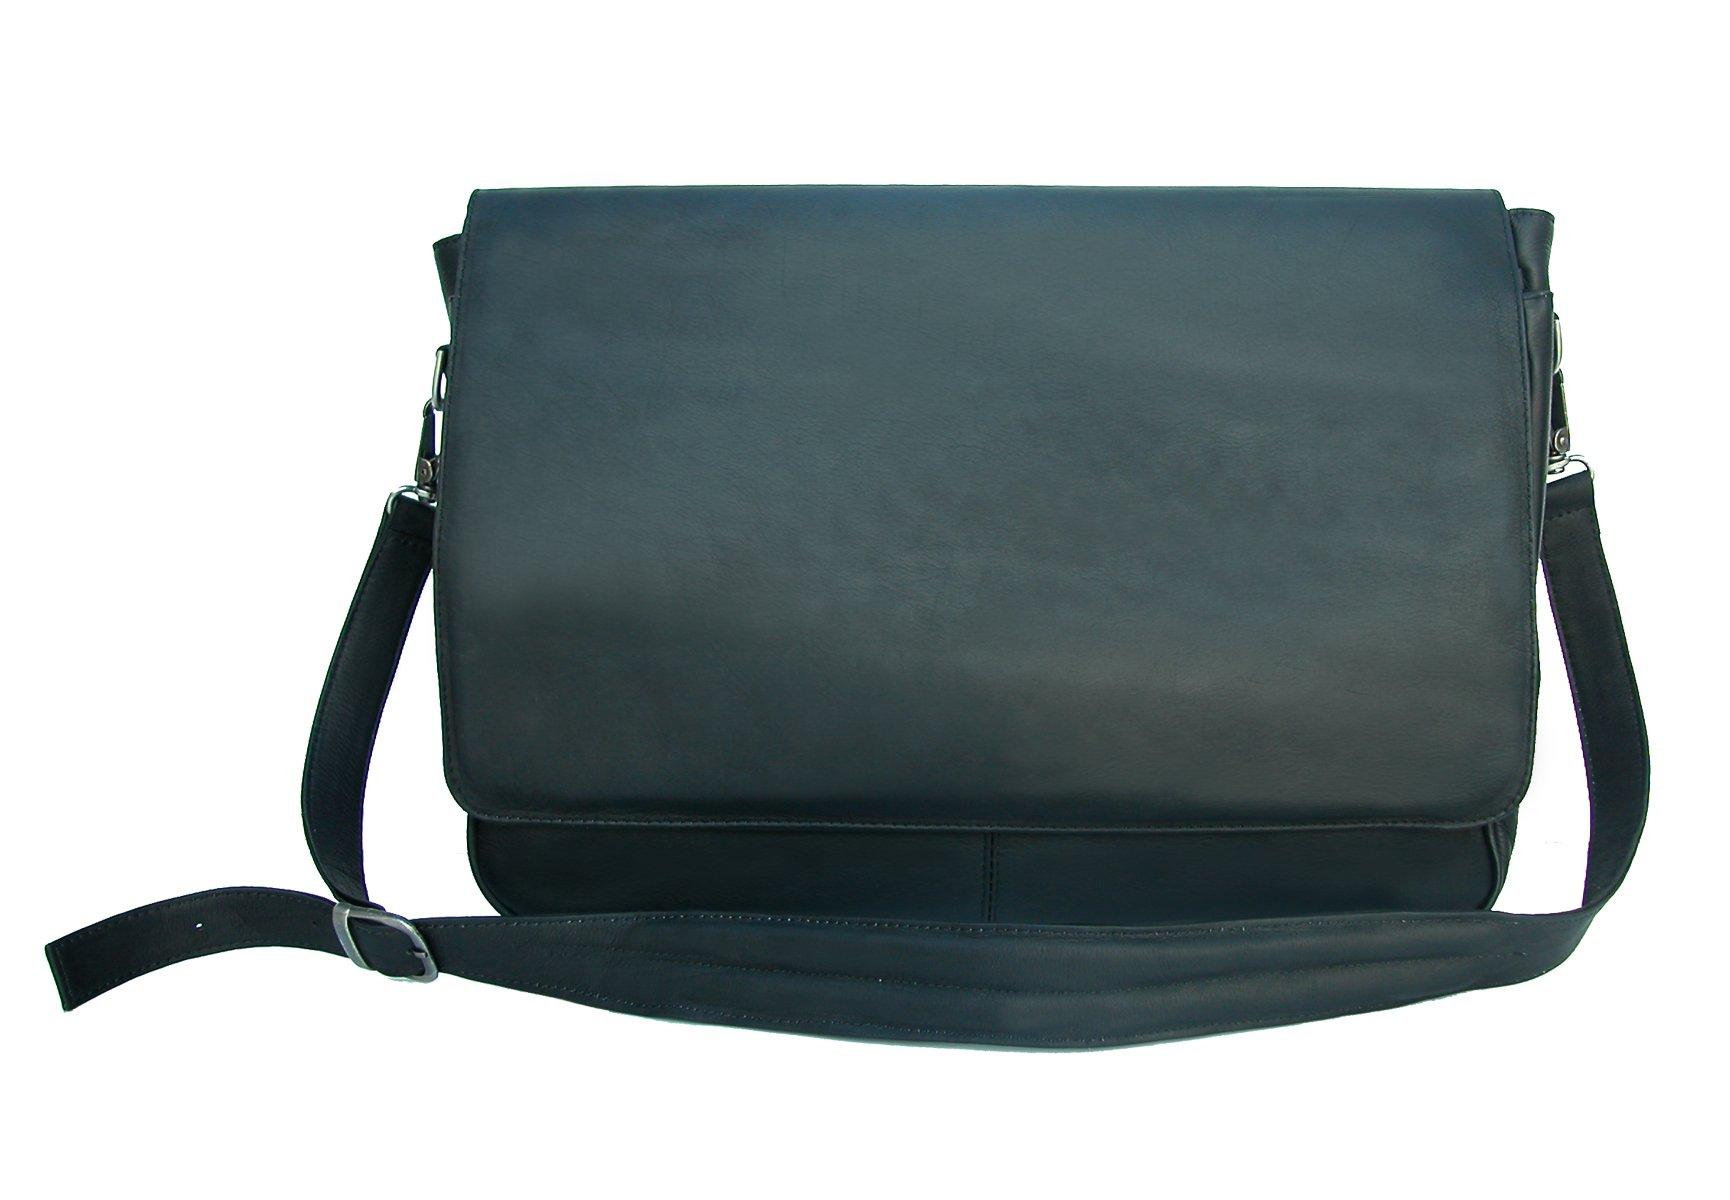 Piel Leather Professional Laptop Messenger, Black, One Size